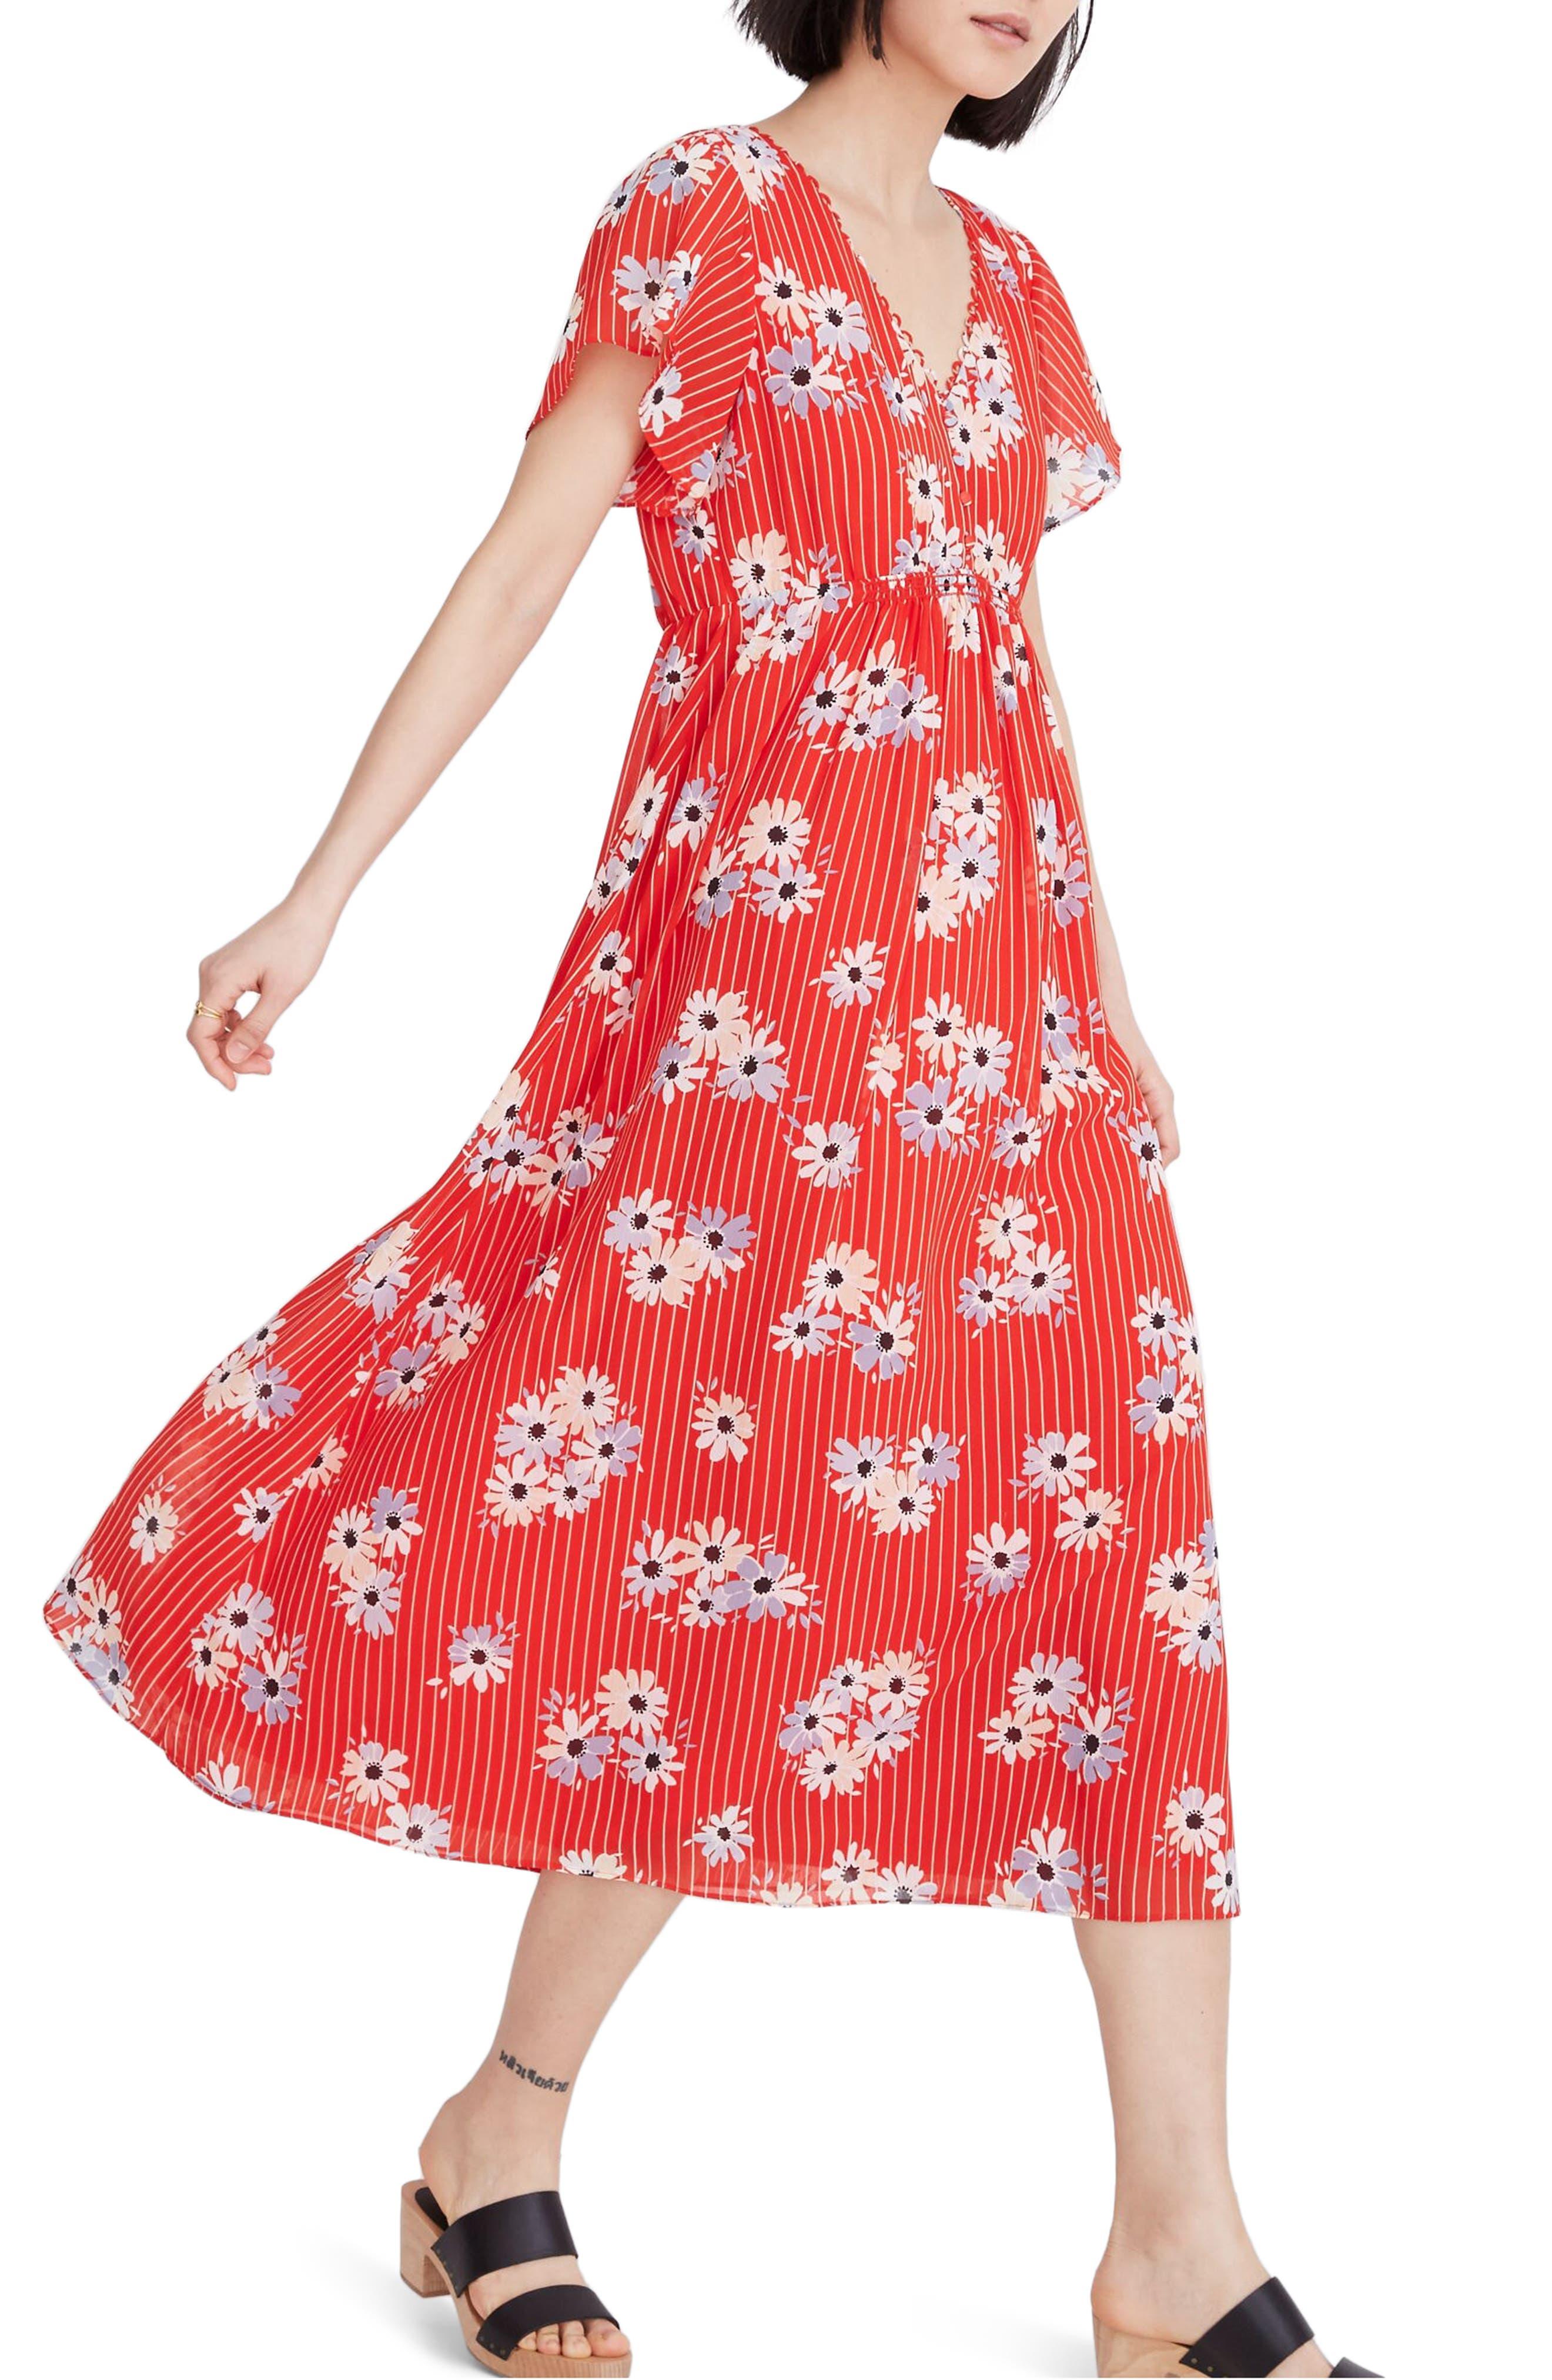 Madewell Daisy Society Scalloped Flutter Sleeve Midi Dress, Red